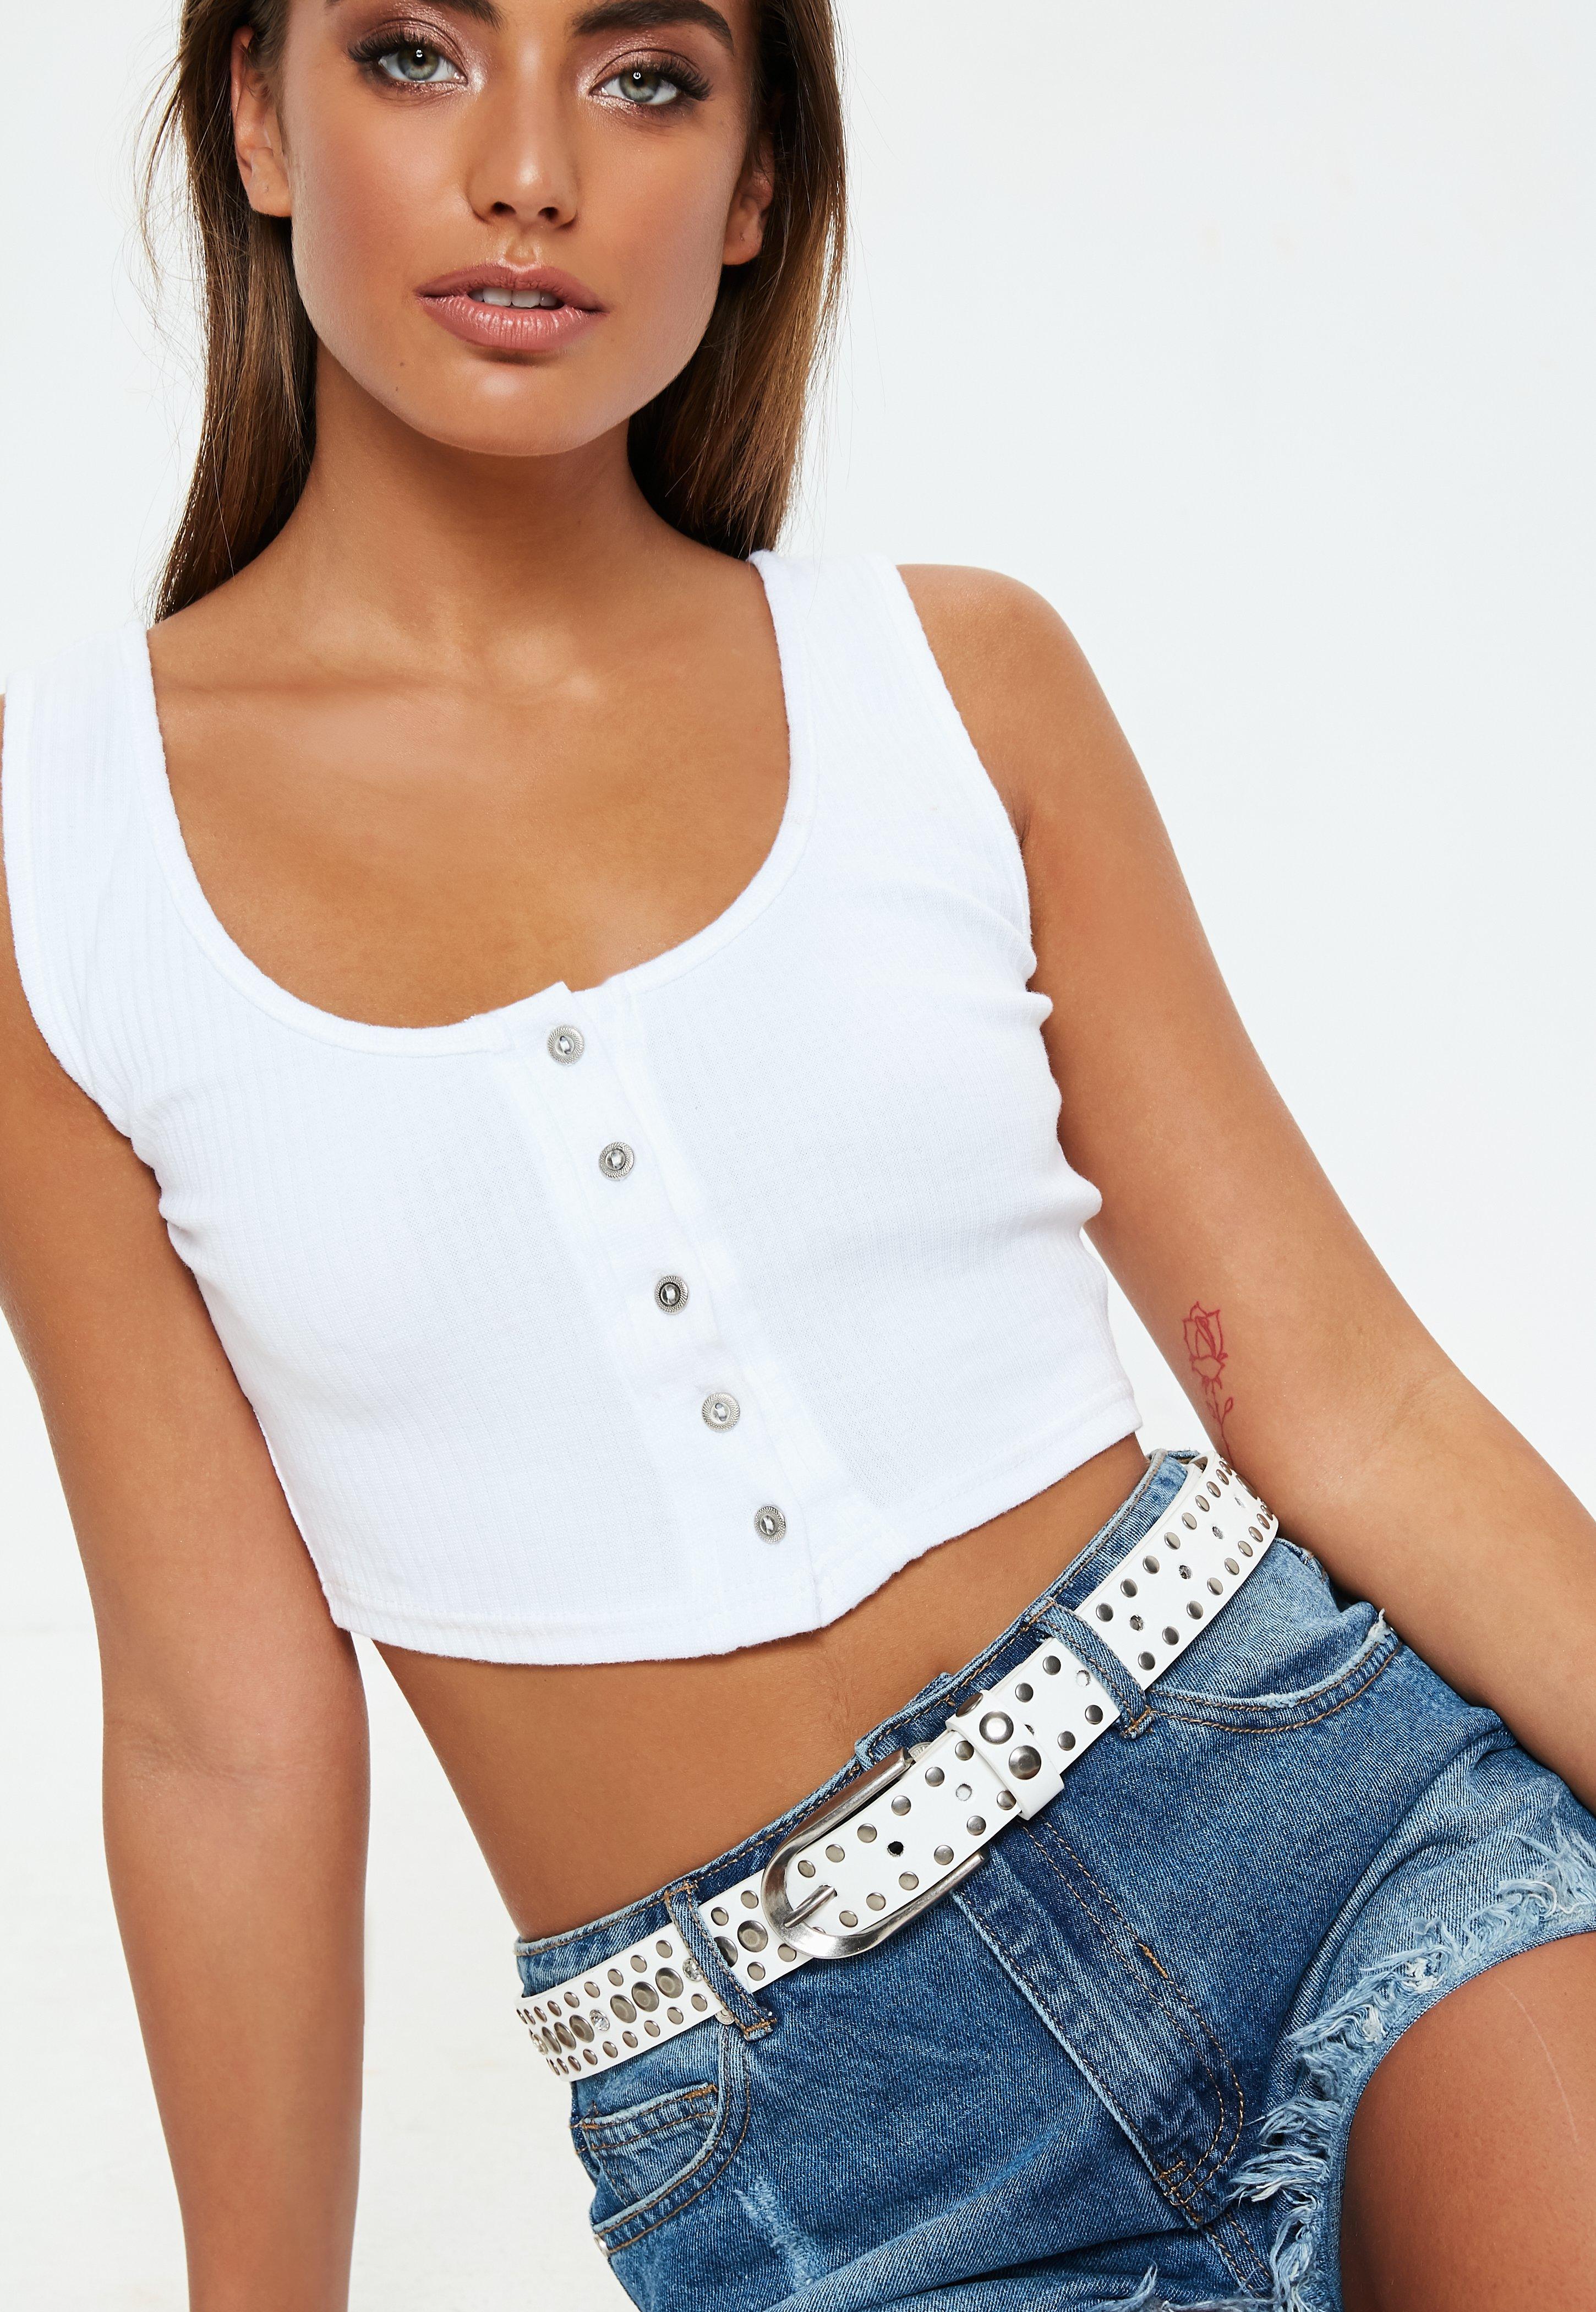 Ceinture femme   Ceinture cuir   corset - Missguided 91315748043